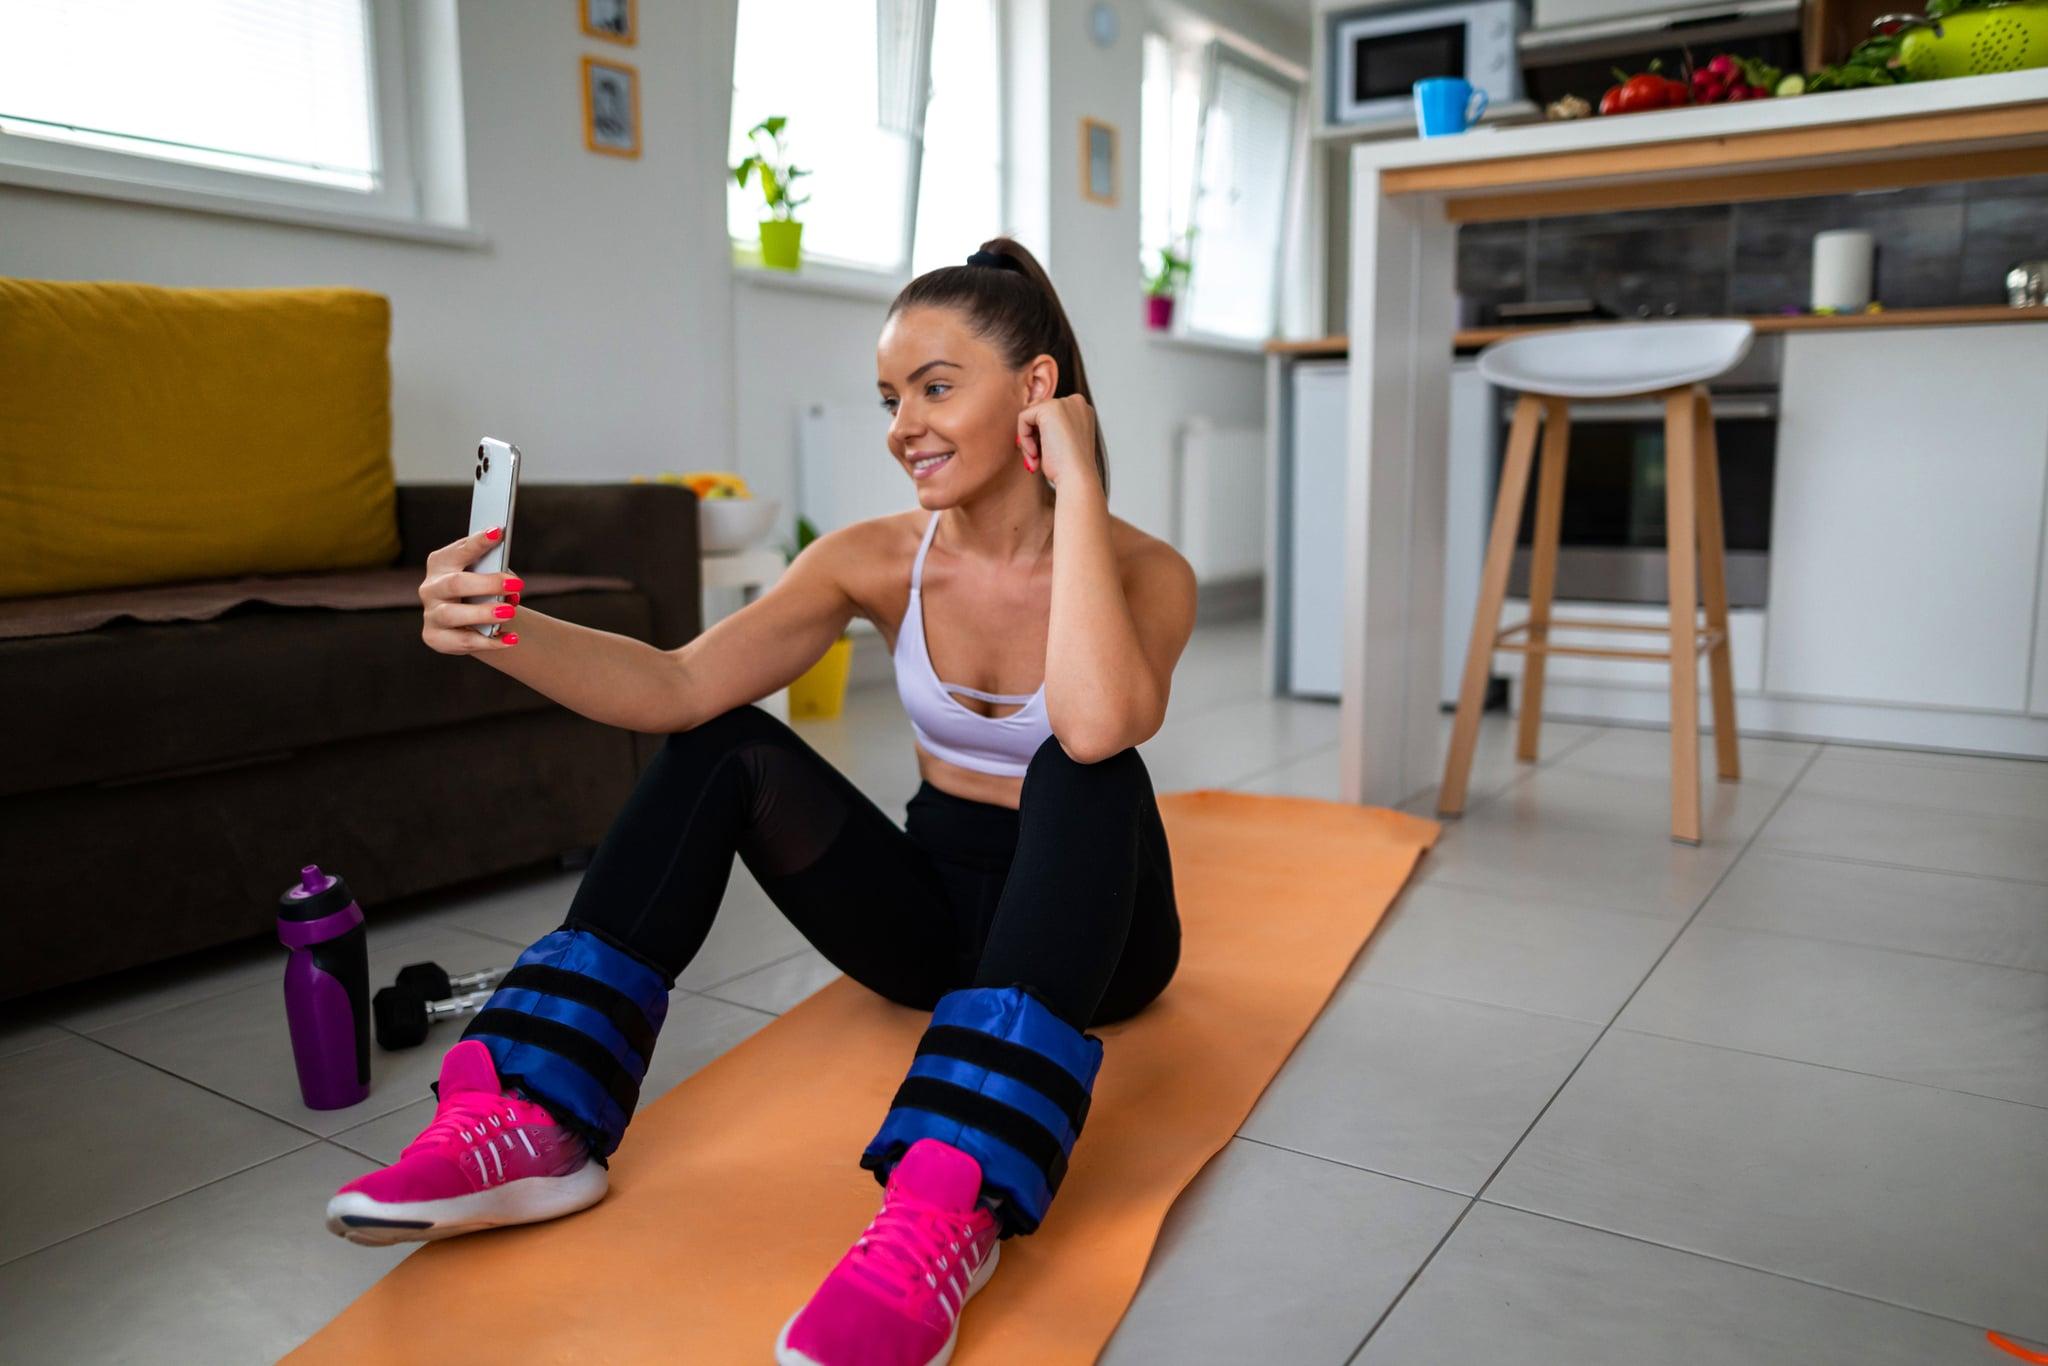 Woman using smartphone on break between exercise